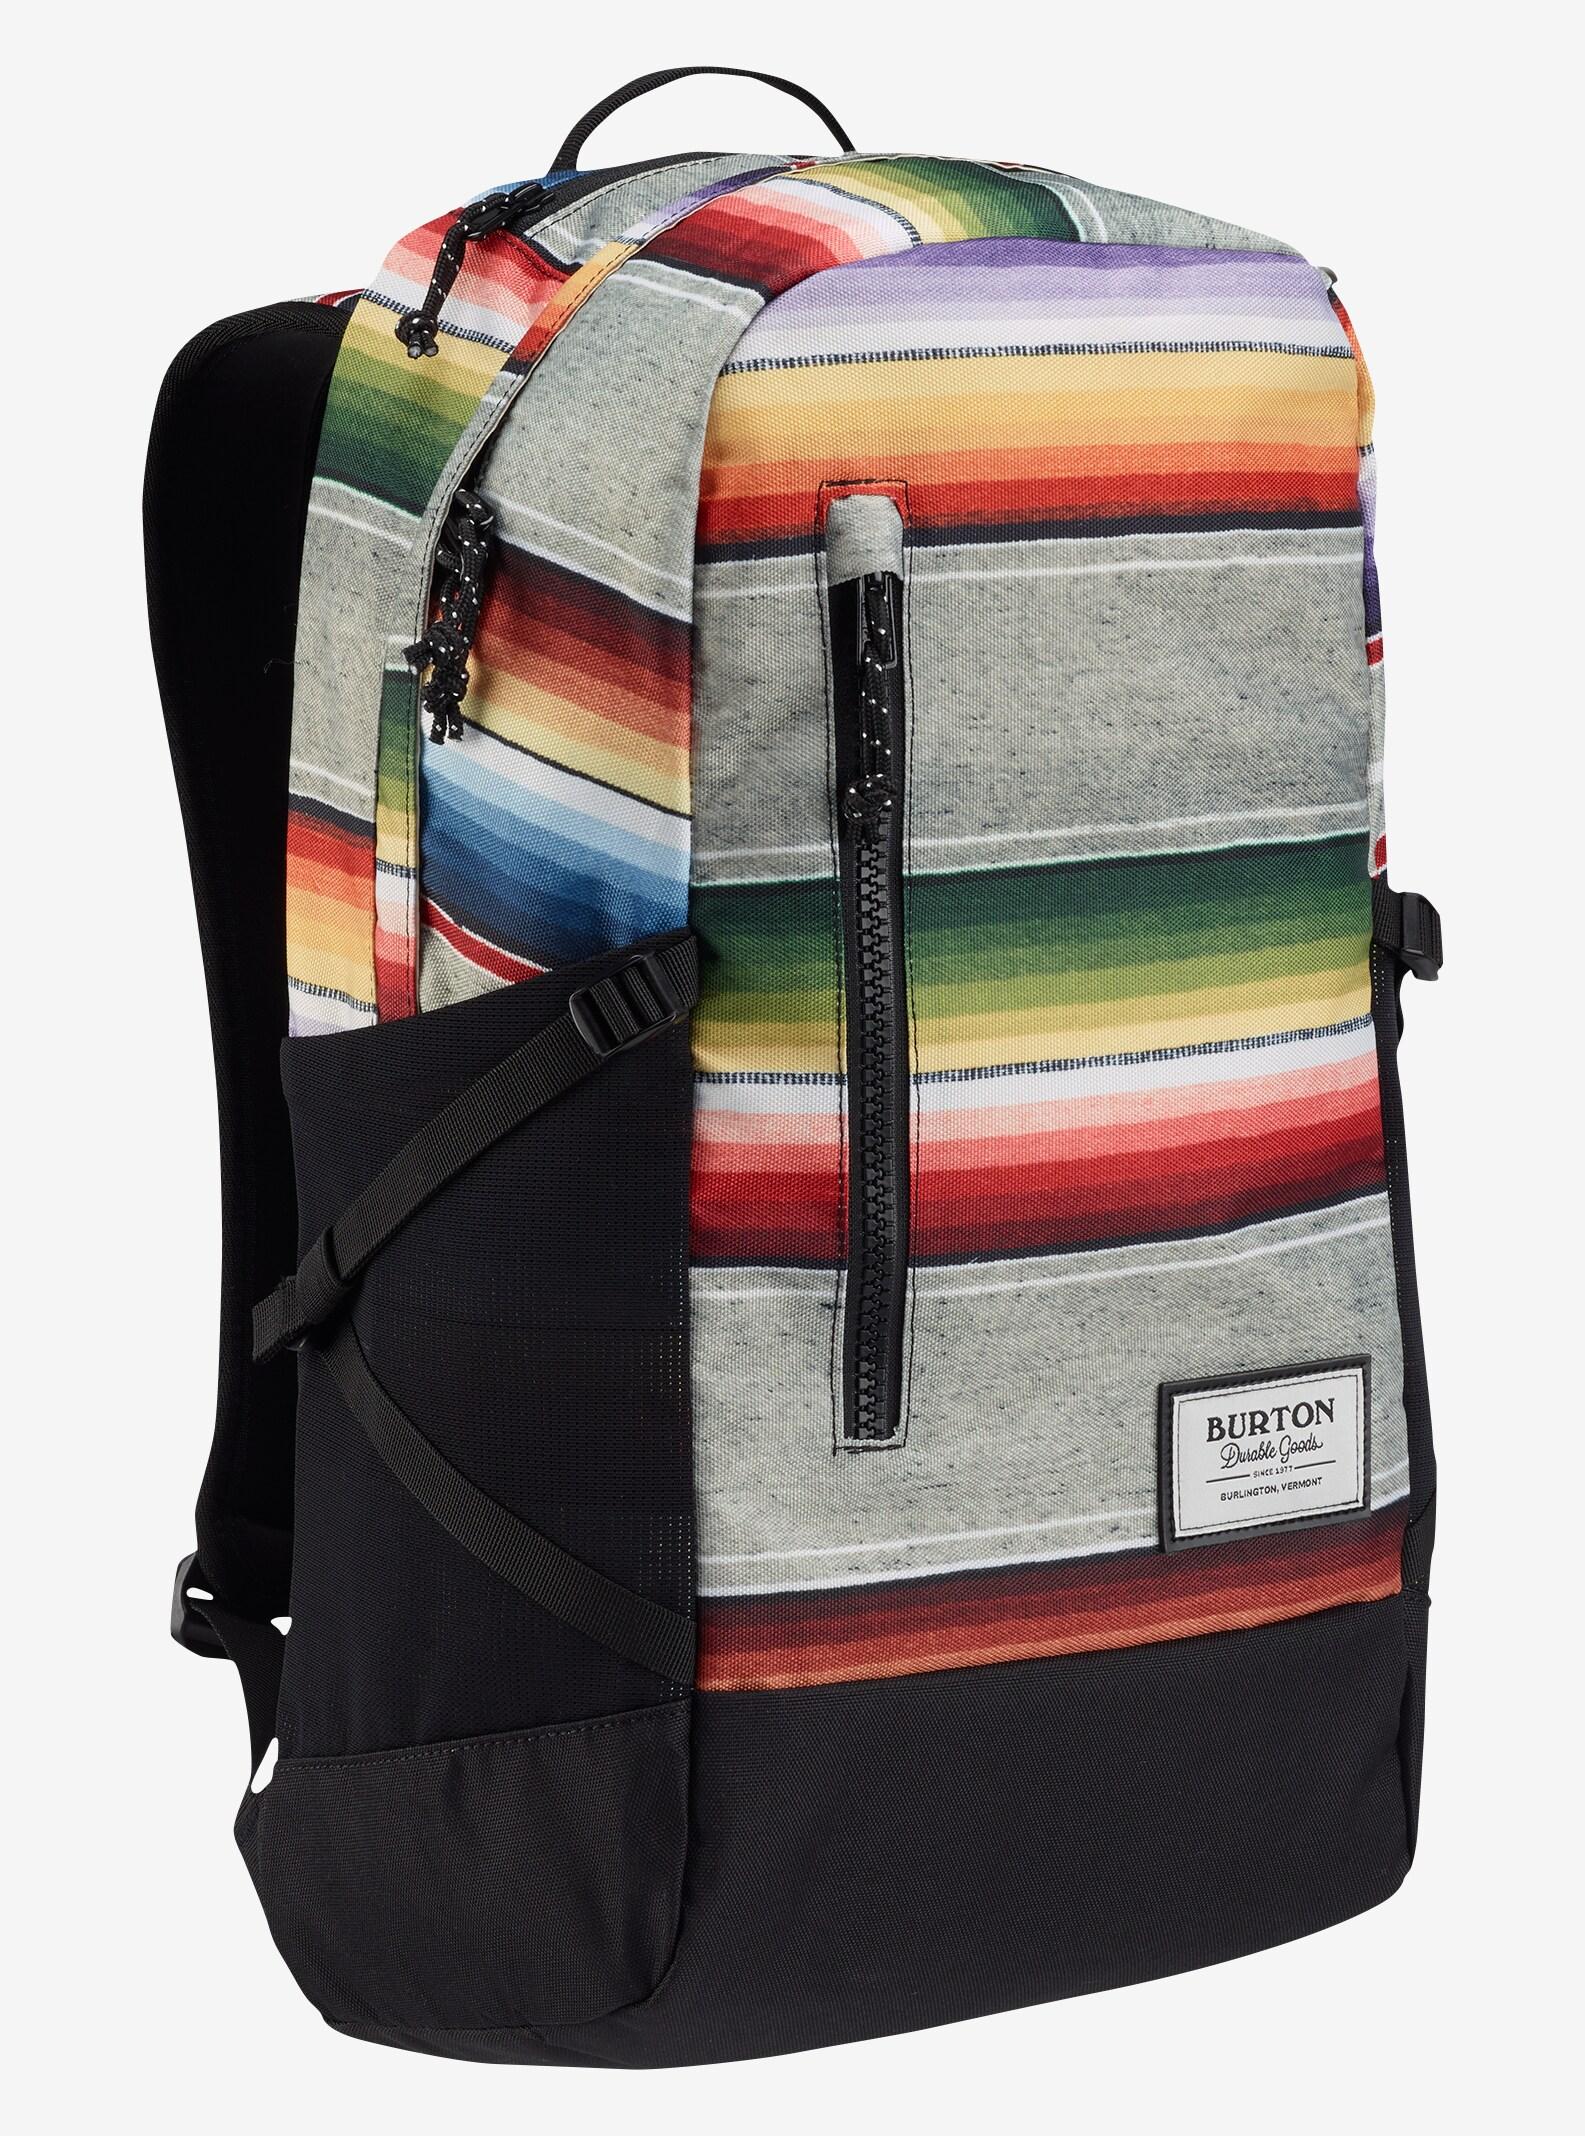 Burton Prospect Backpack shown in Bright Sinola Stripe Print